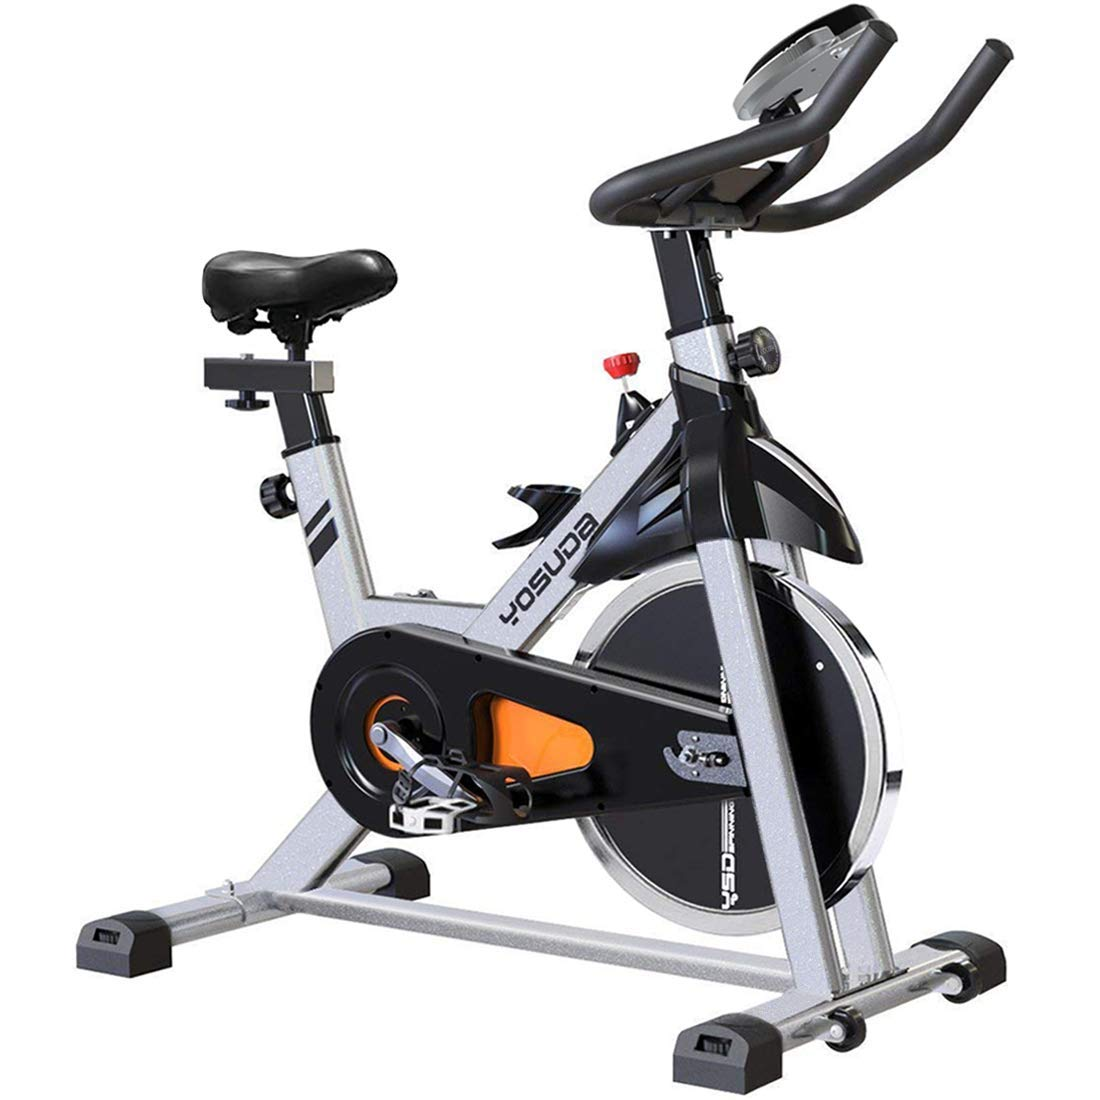 YOSUDA Indoor Cycling Bike Stationary – Cycle Bike with Ipad Mount &Comfortable Seat Cushion (Gray)